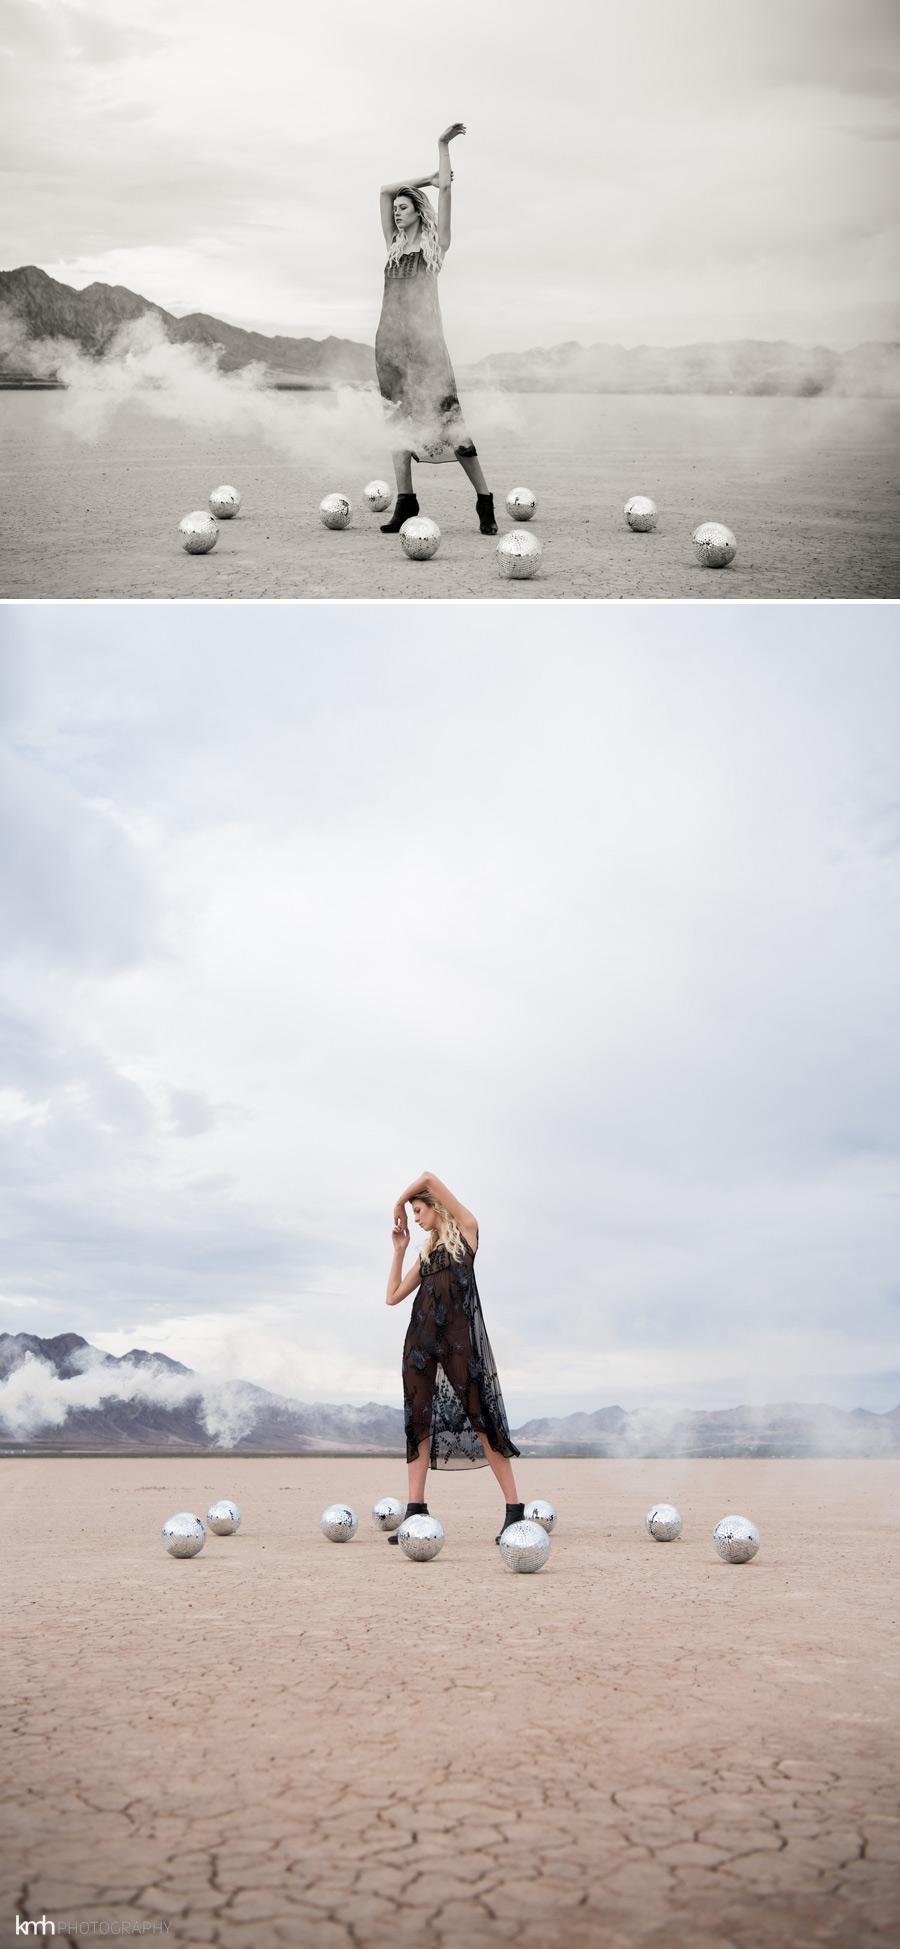 Metallic Desert Fashion Photoshoot | KMH Photography | Las Vegas Portrait Photographer